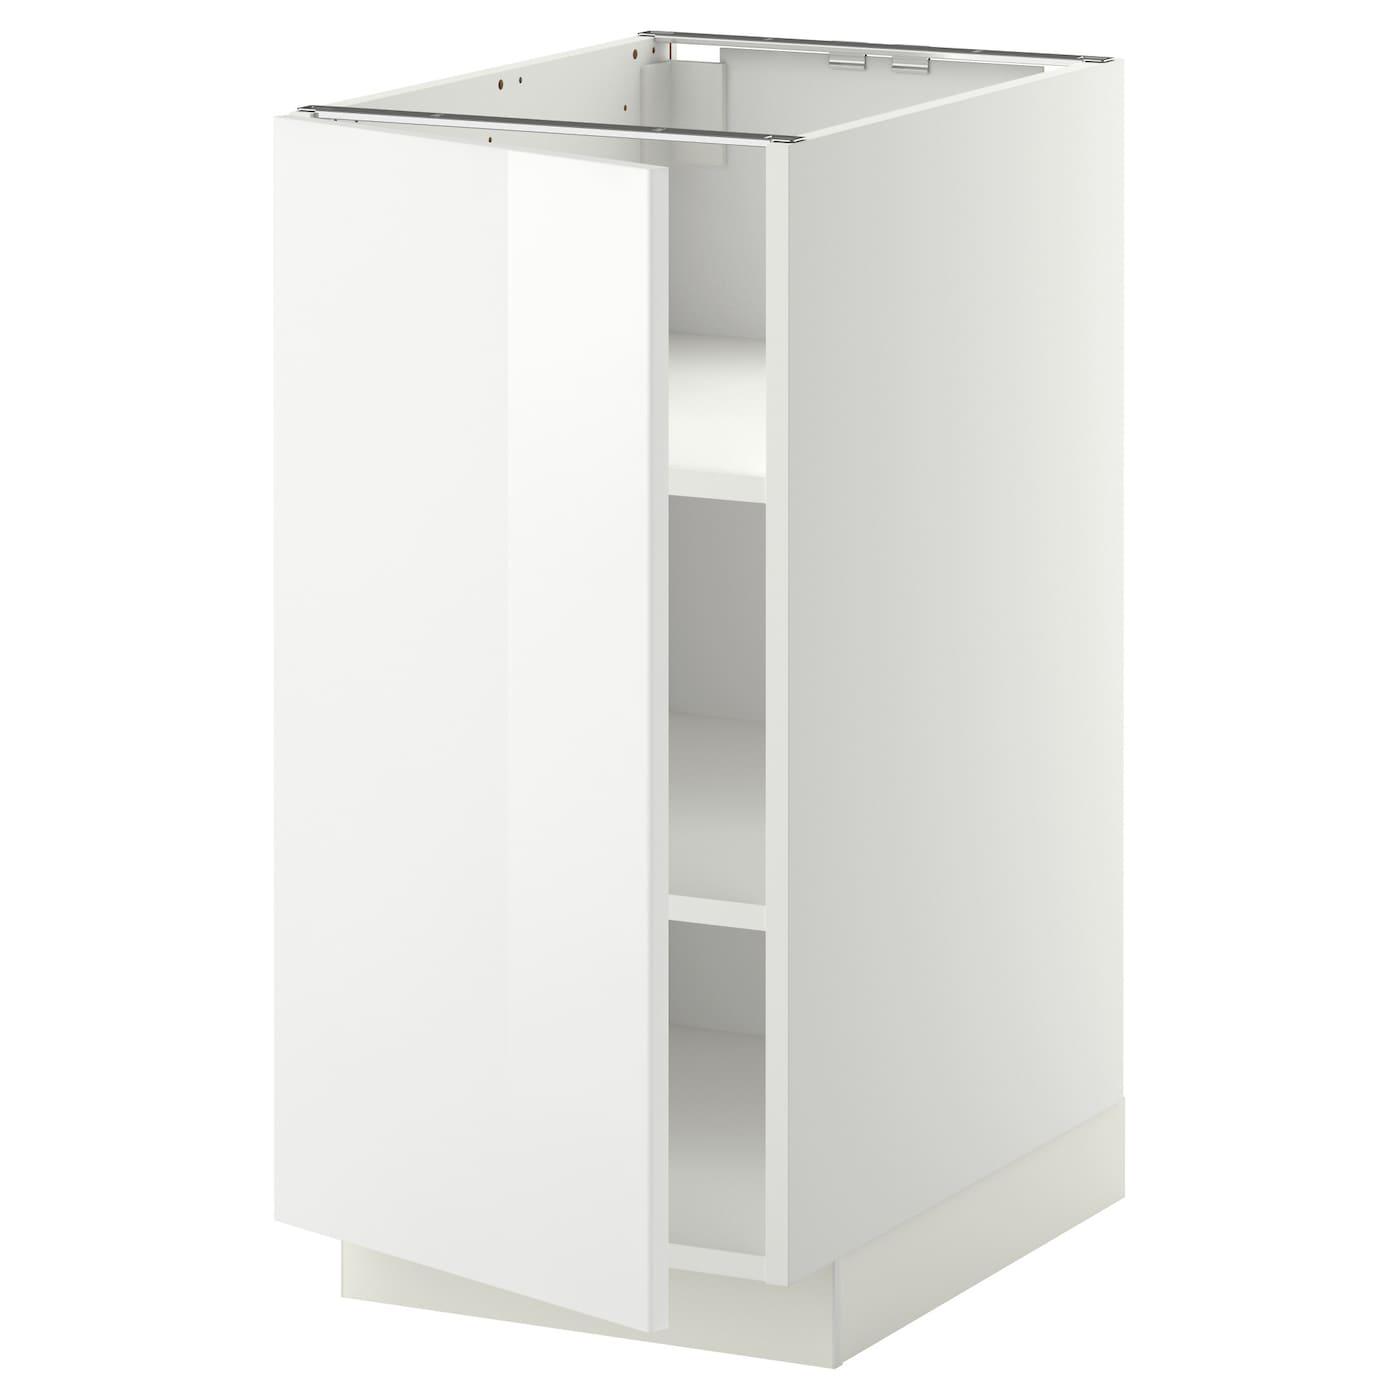 Ringhult Drawer Front High Gloss White 60 X 40 Cm: METOD Base Cabinet With Shelves White/ringhult White 40 X